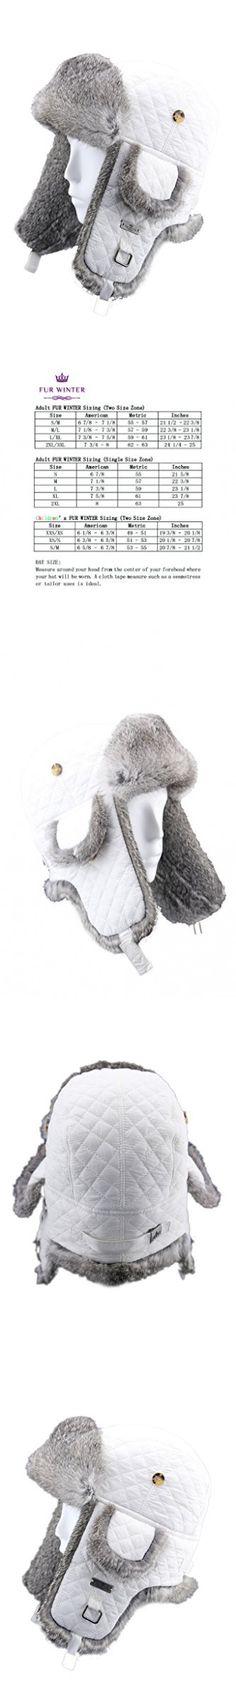 FUR WINTER Rabbit Fur Diamond Quilted Nylon Aviator Bomber Trapper Hat WHI/GRY L/XL